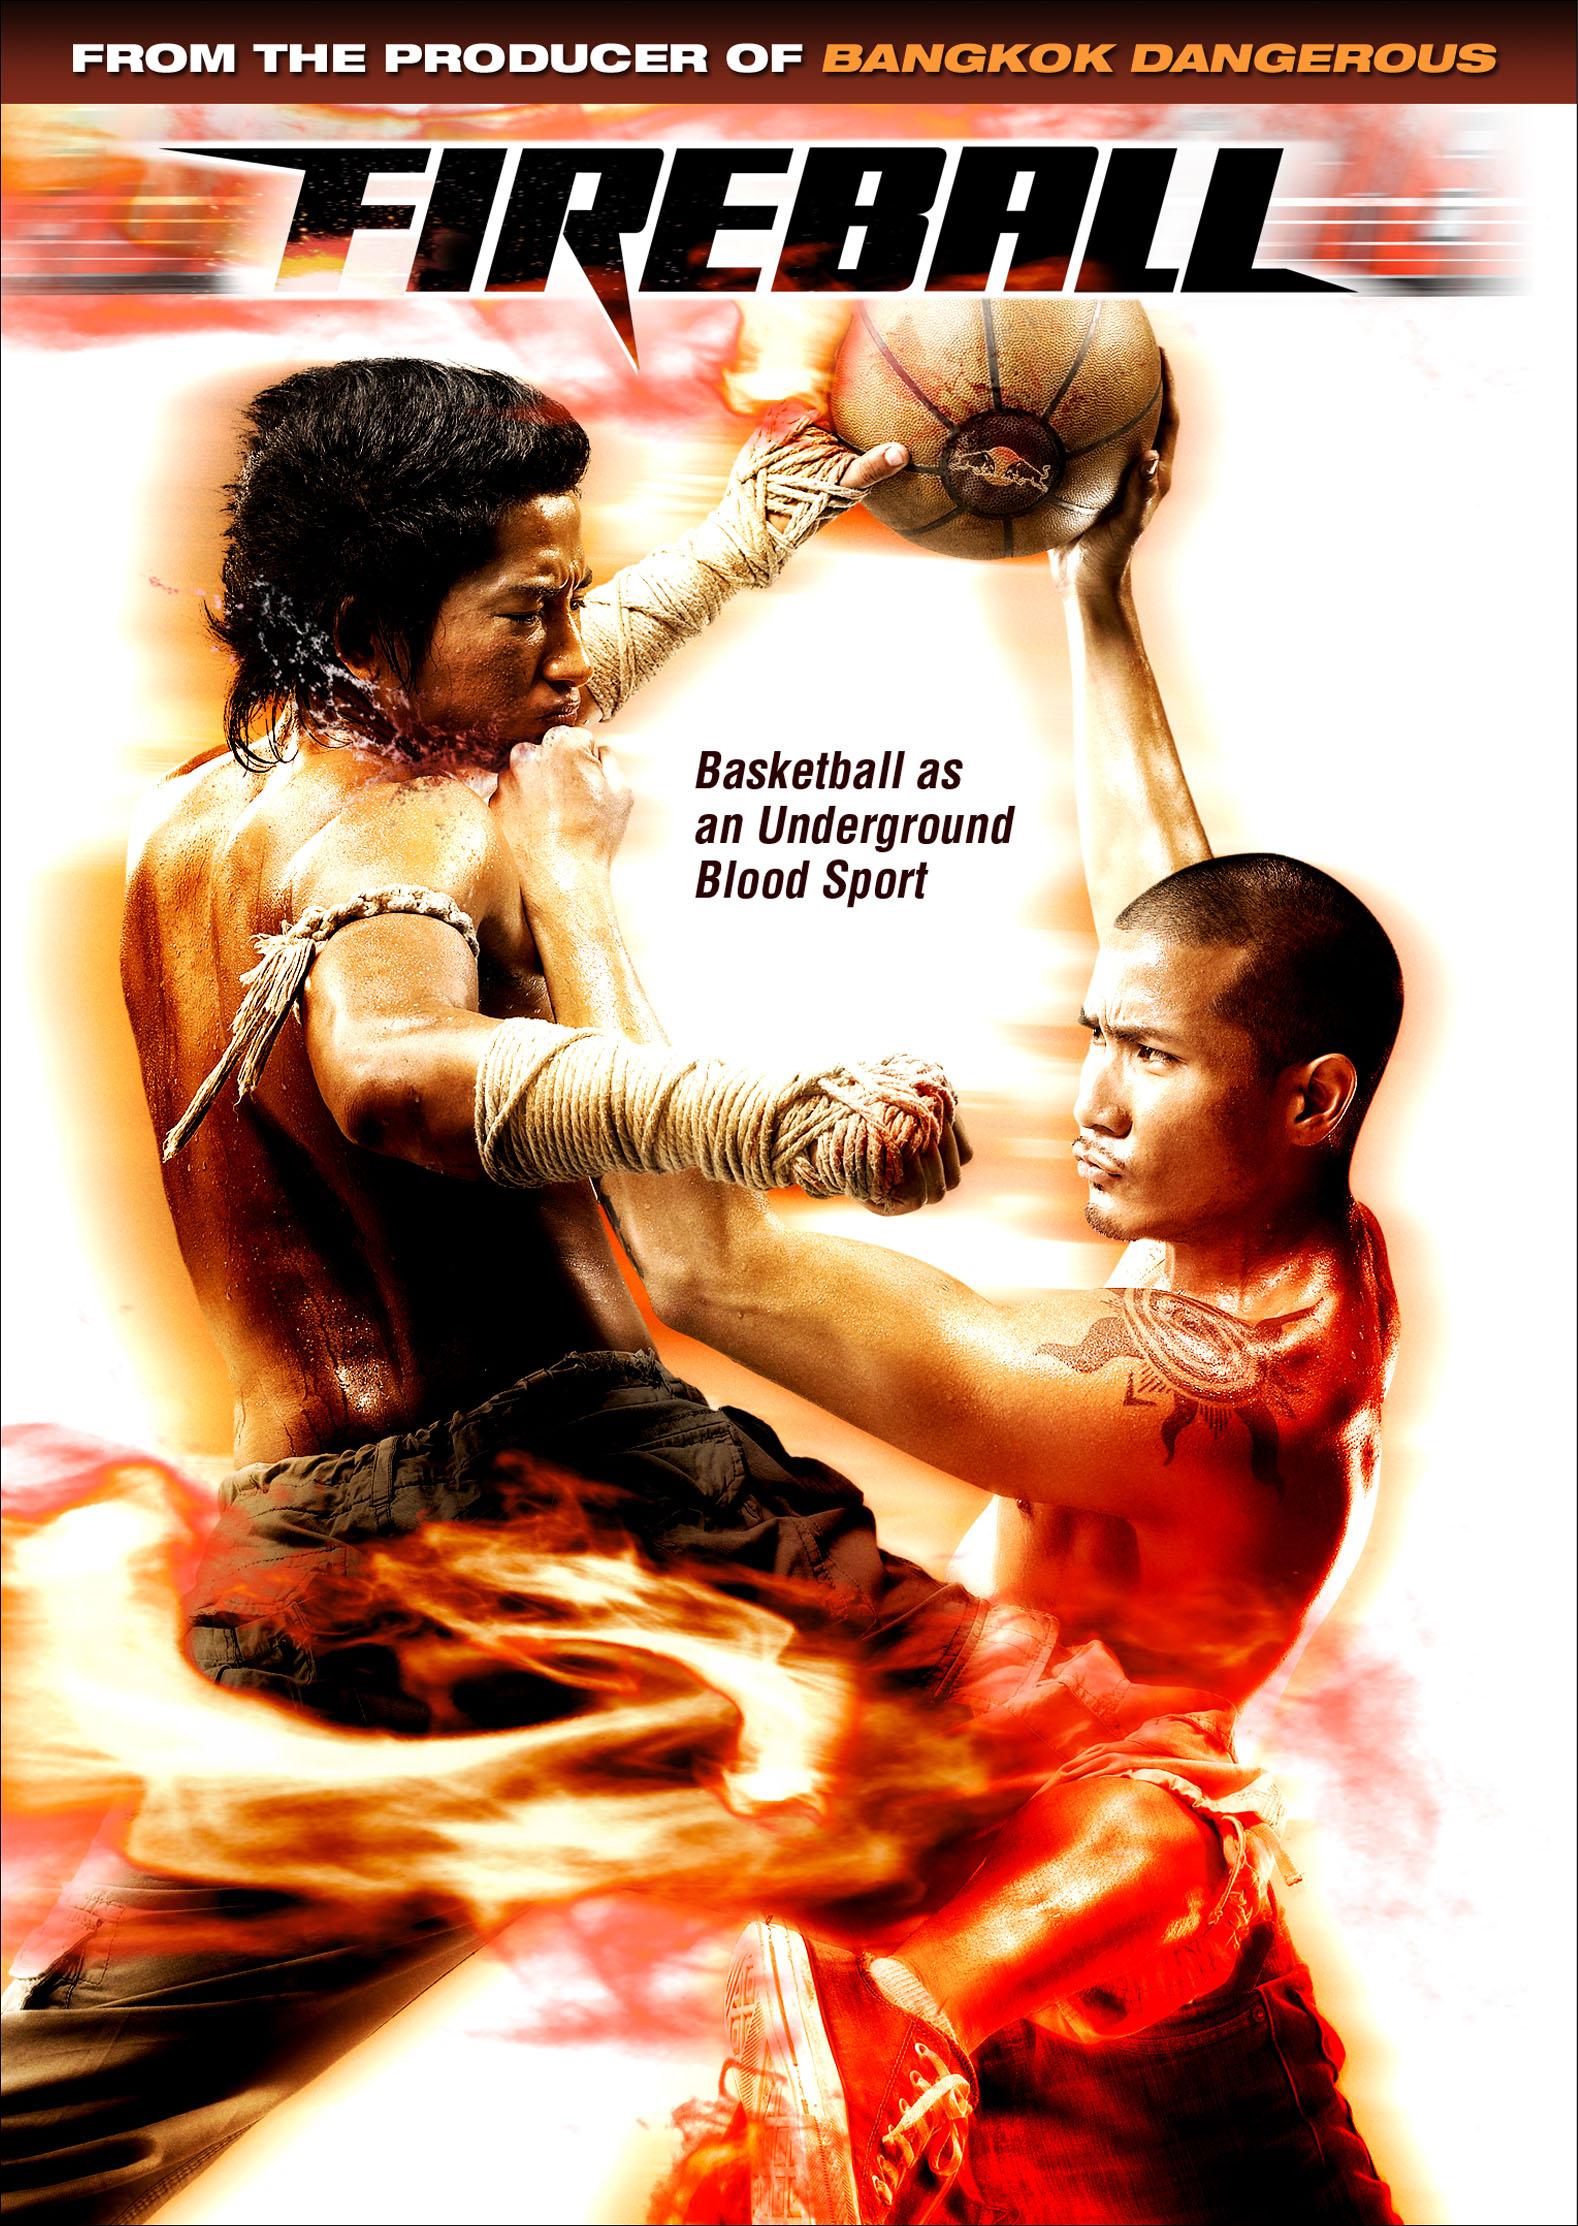 Fireball [Dub] – IMDB 5.1